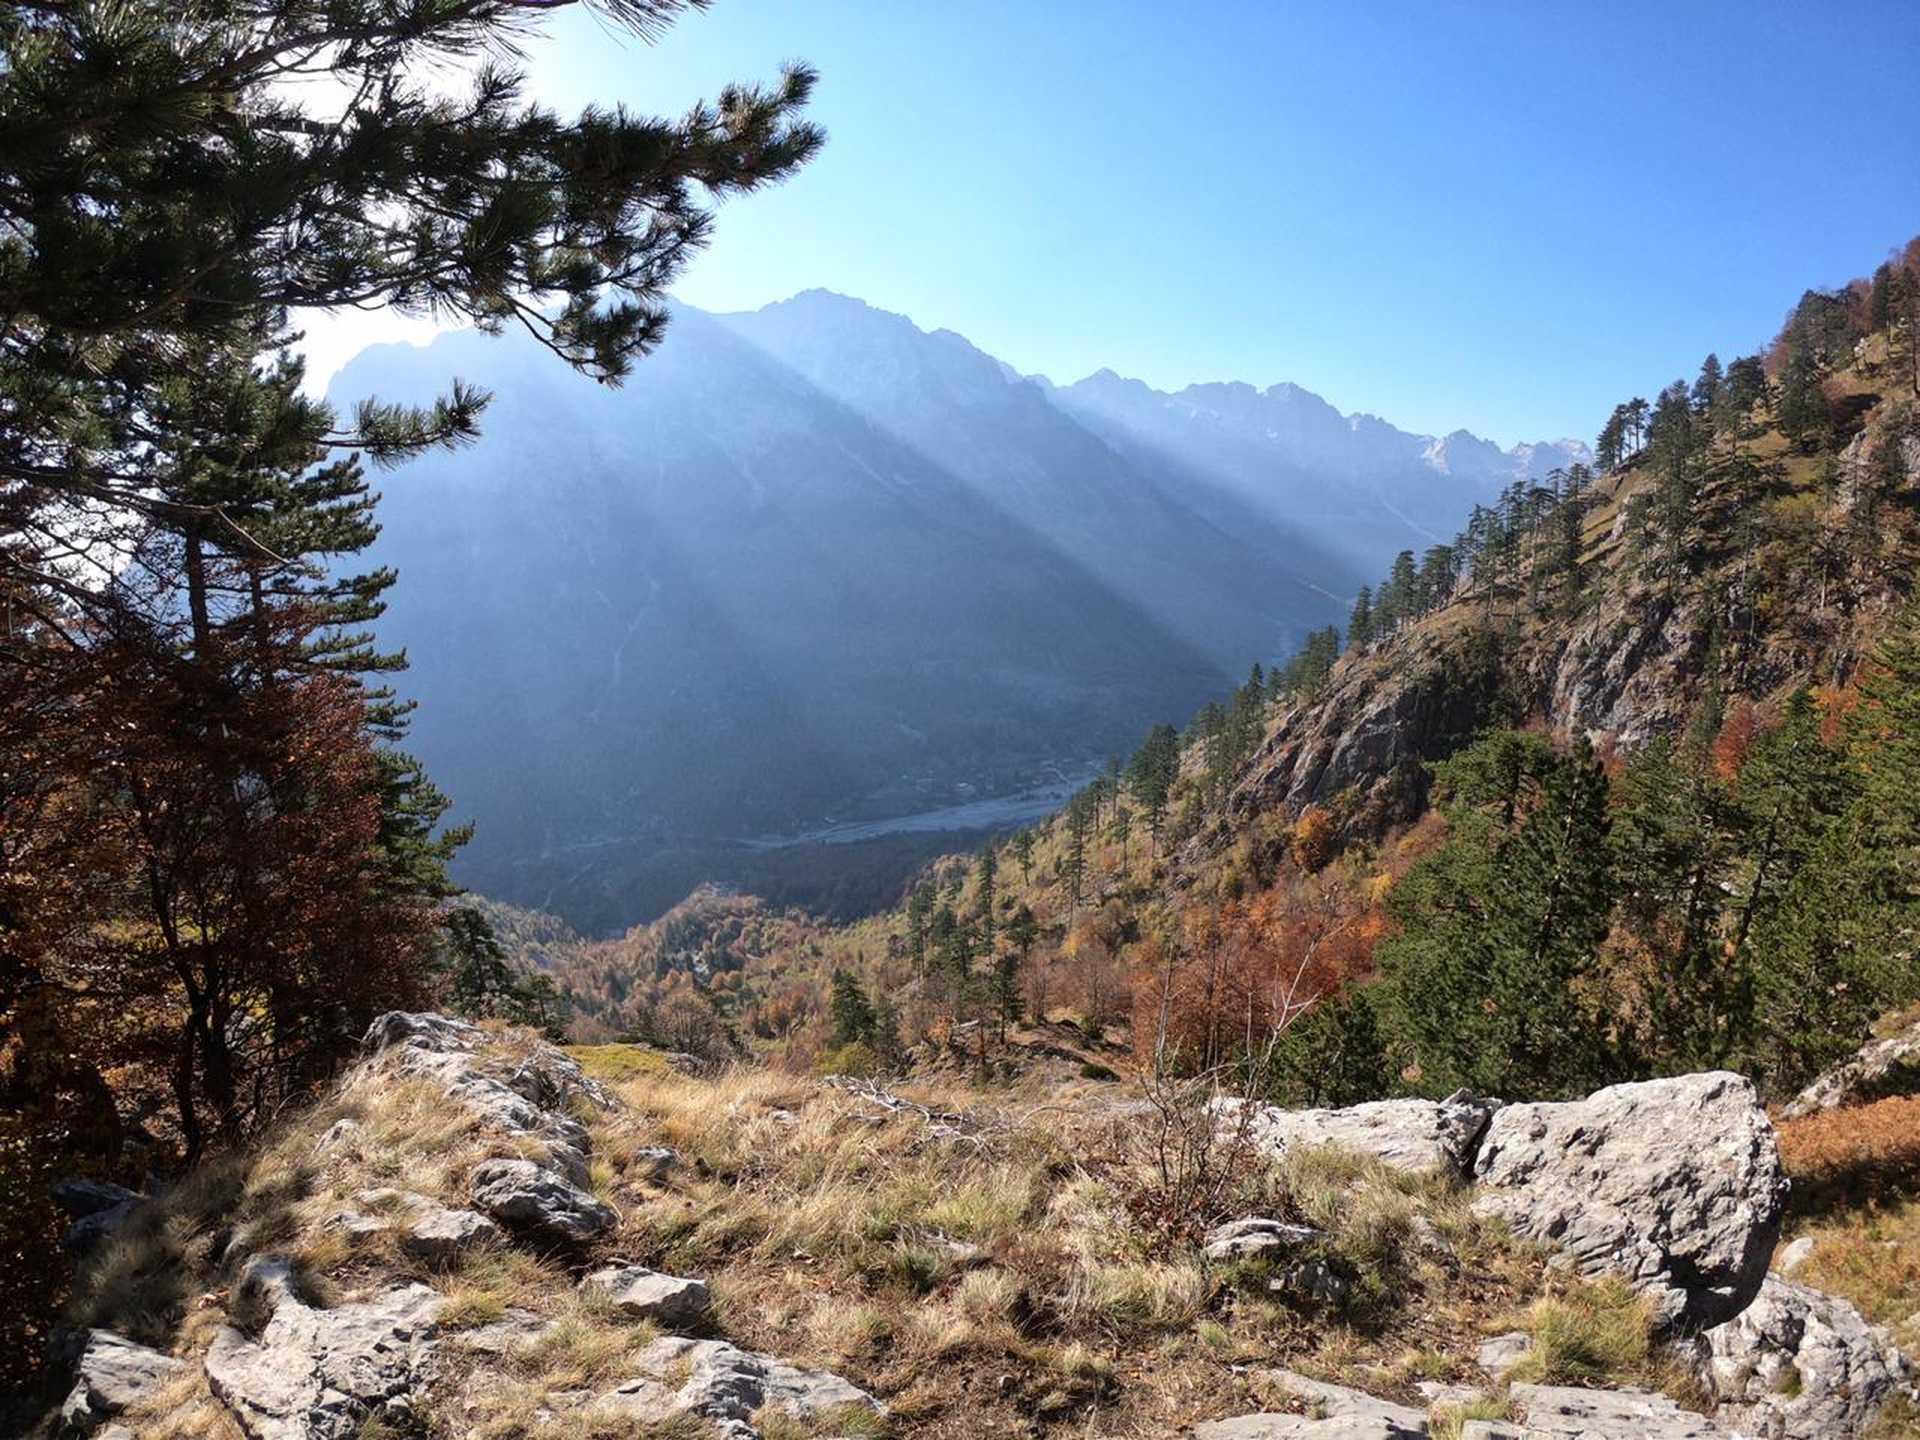 Albanie, vers le lac de Dashi